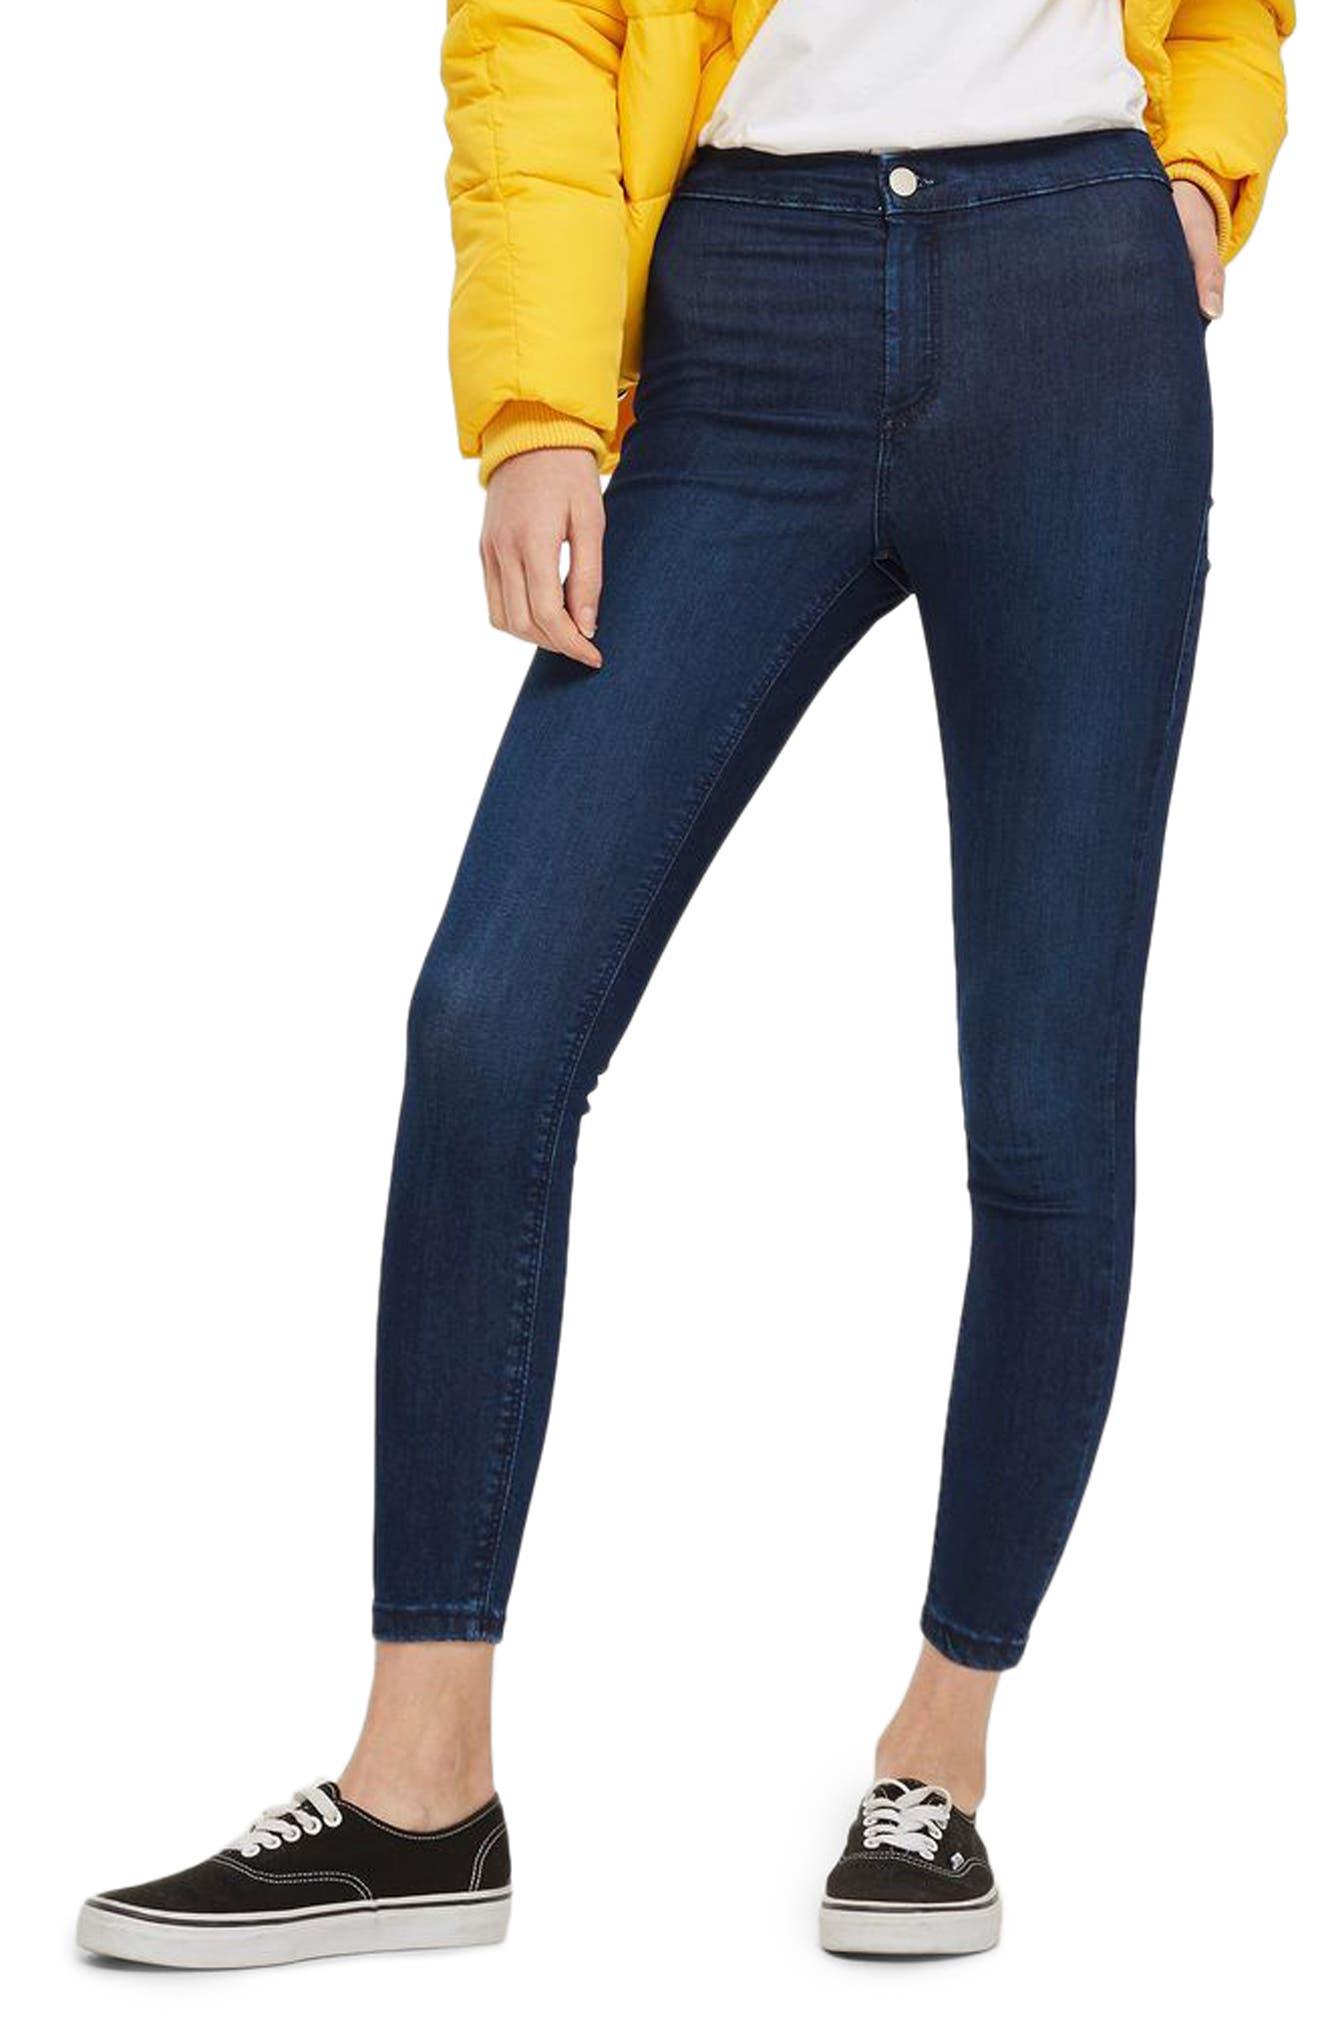 Joni High Waist Skinny Jeans,                         Main,                         color, 400